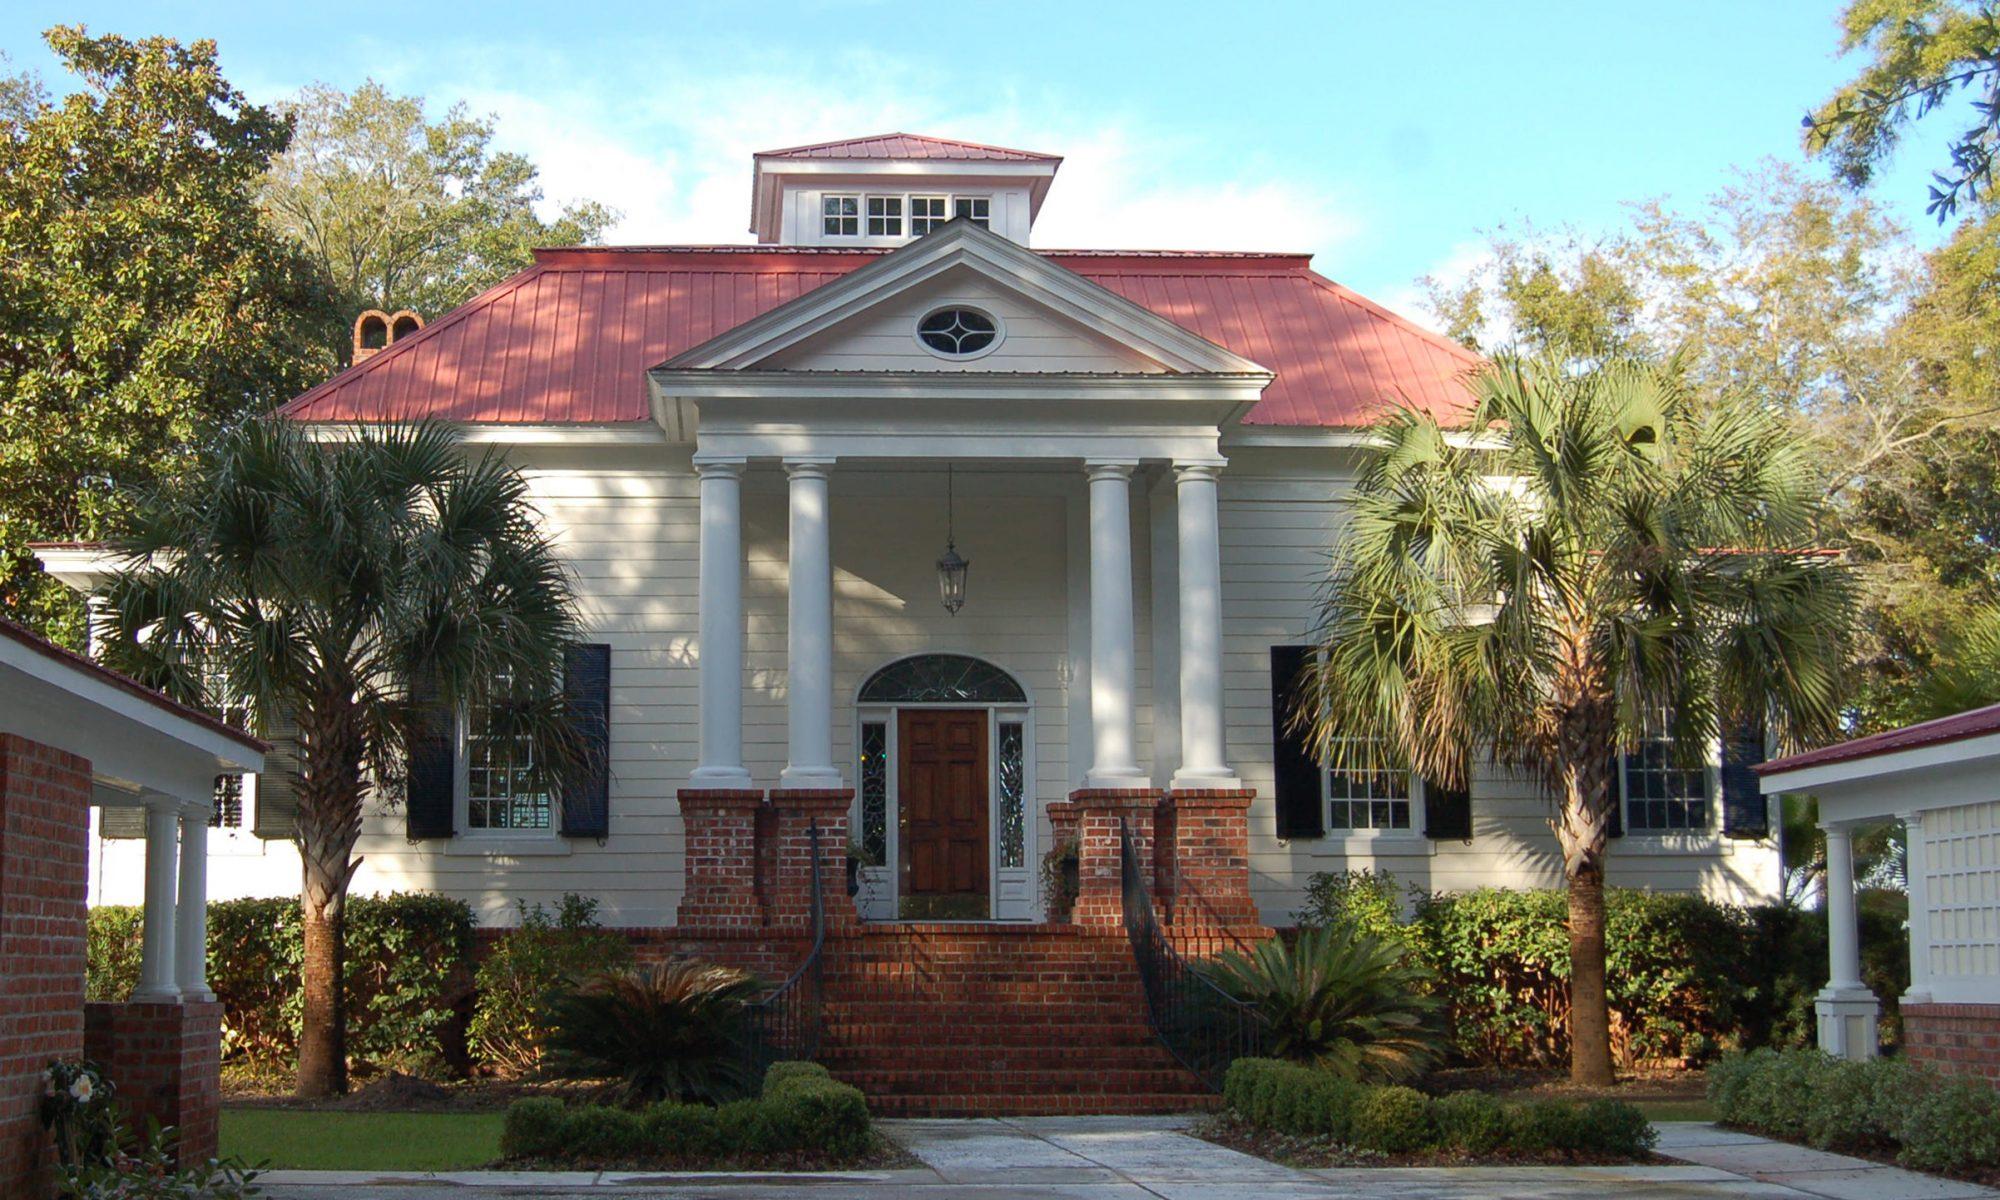 southern coastal style architecture